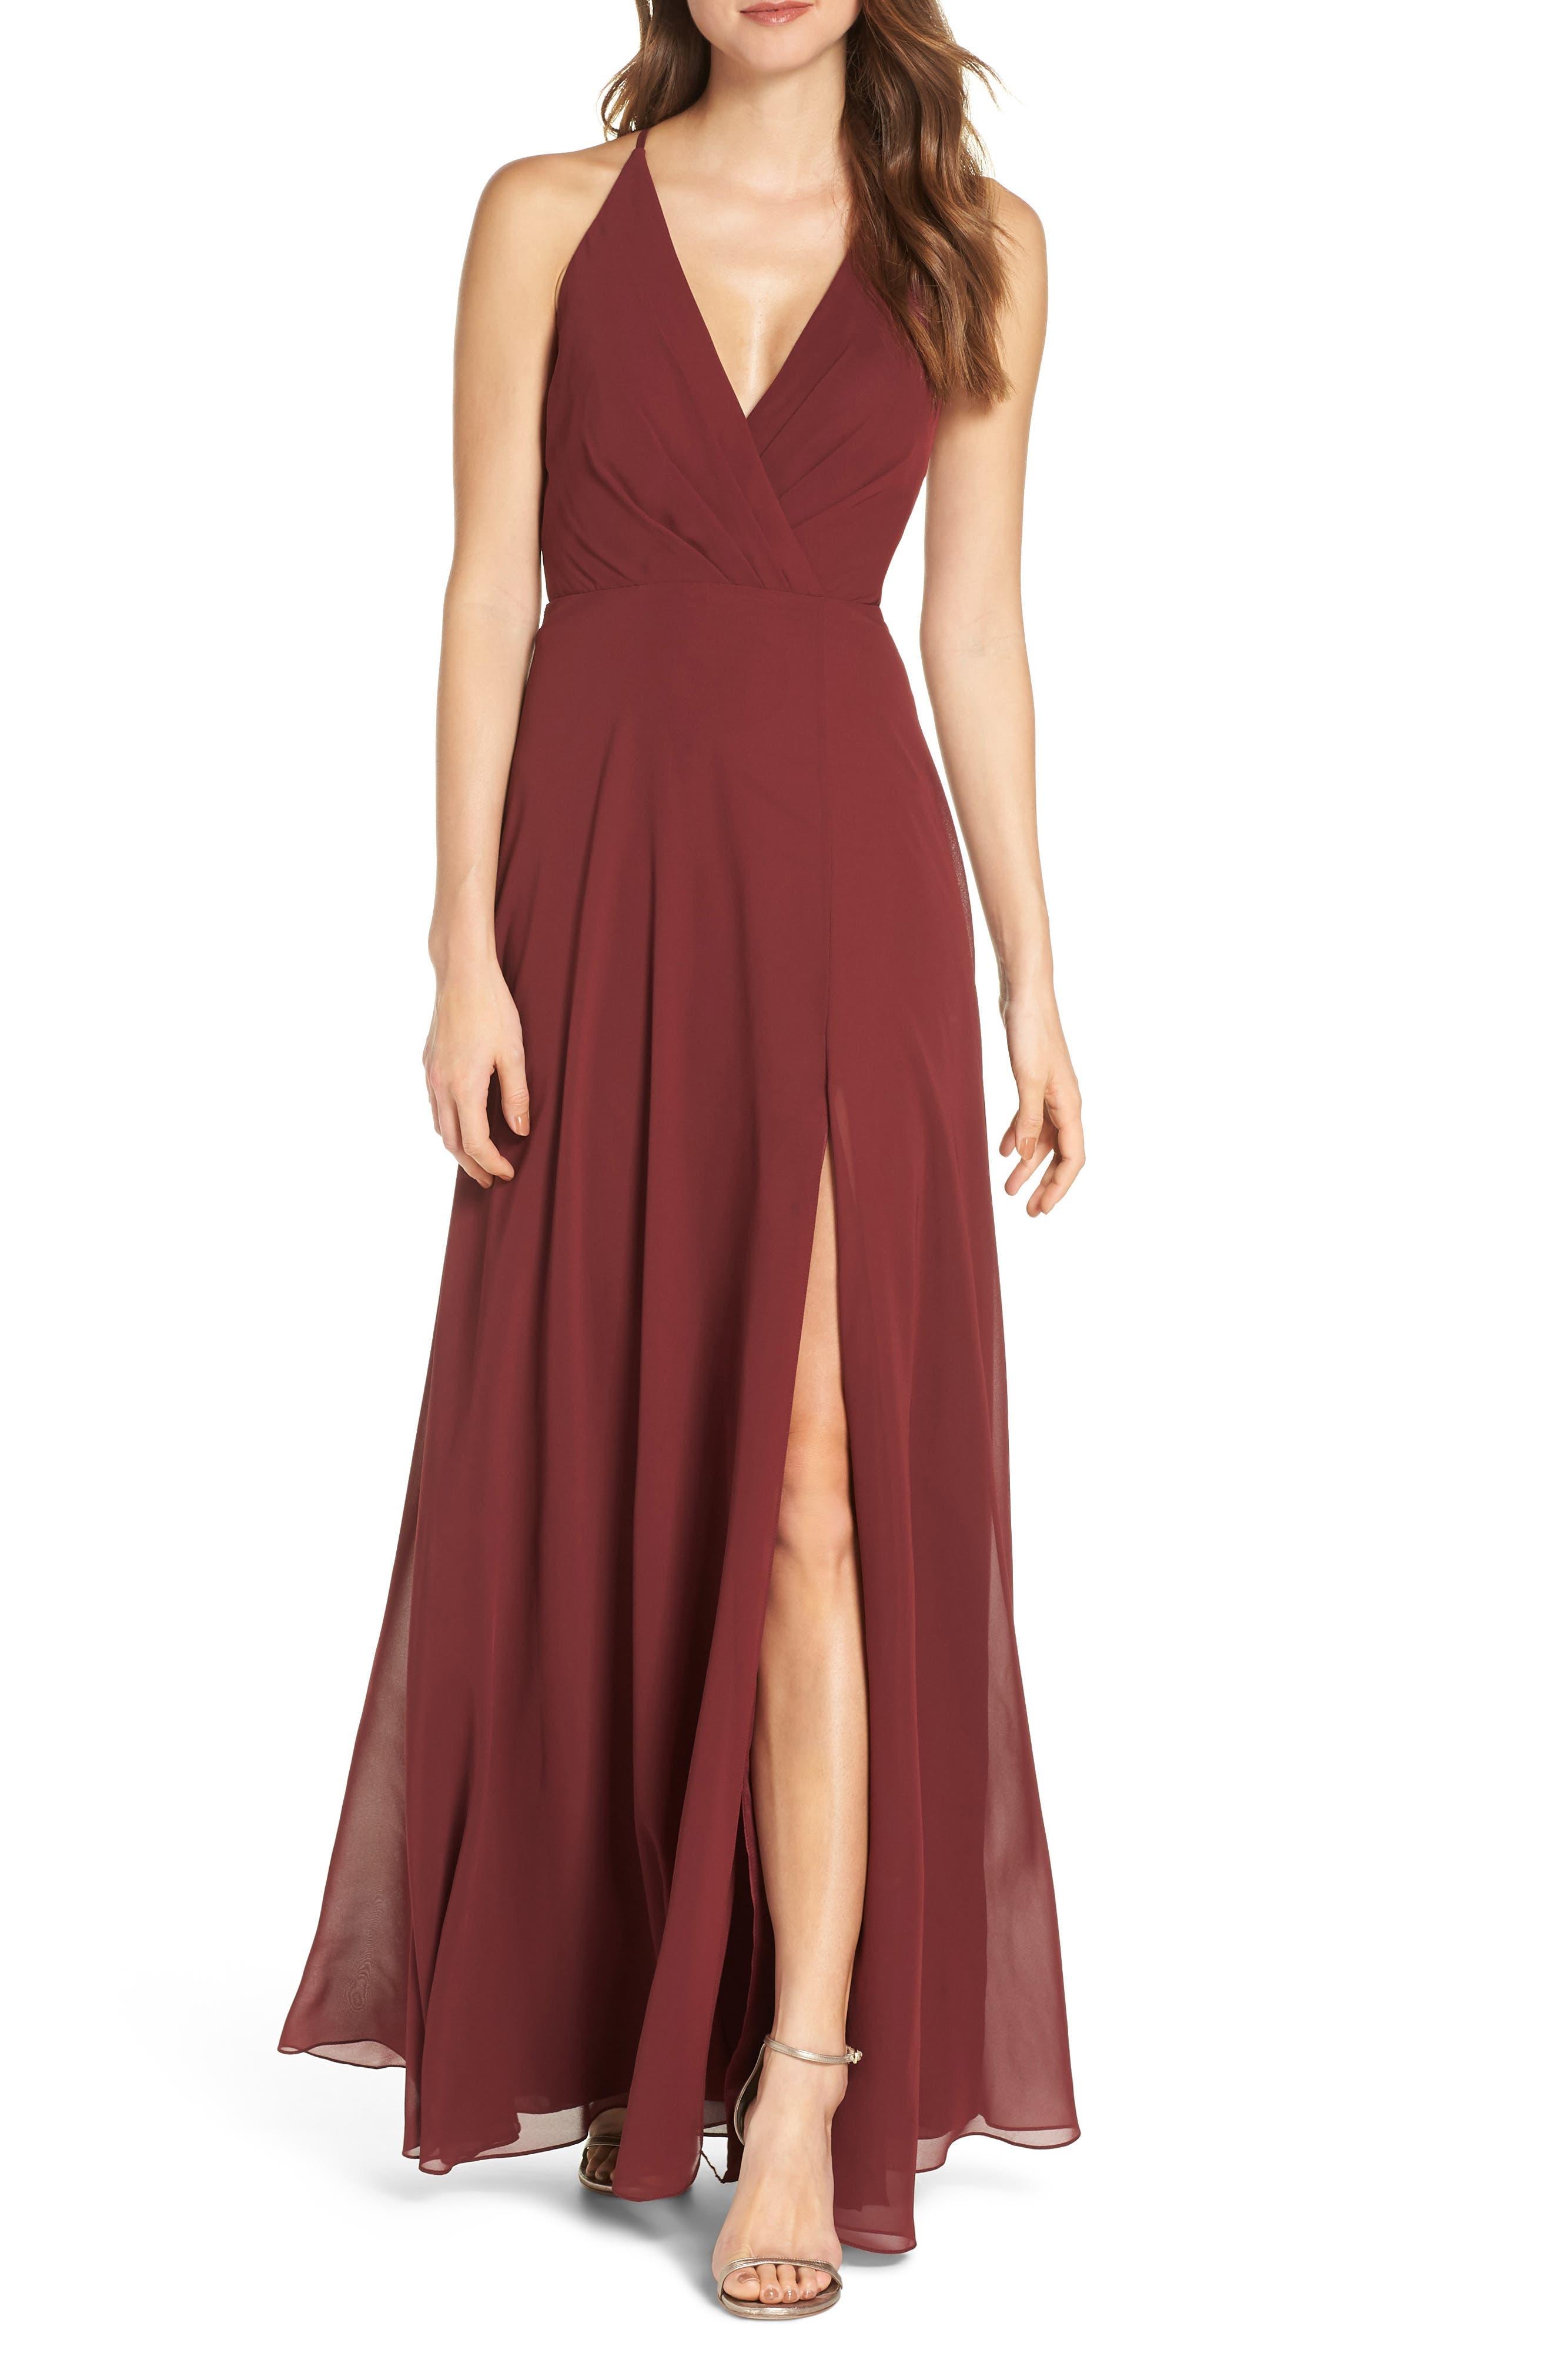 Jenny Yoo Bryce Surplice V-Neck Chiffon Evening Dress, Red